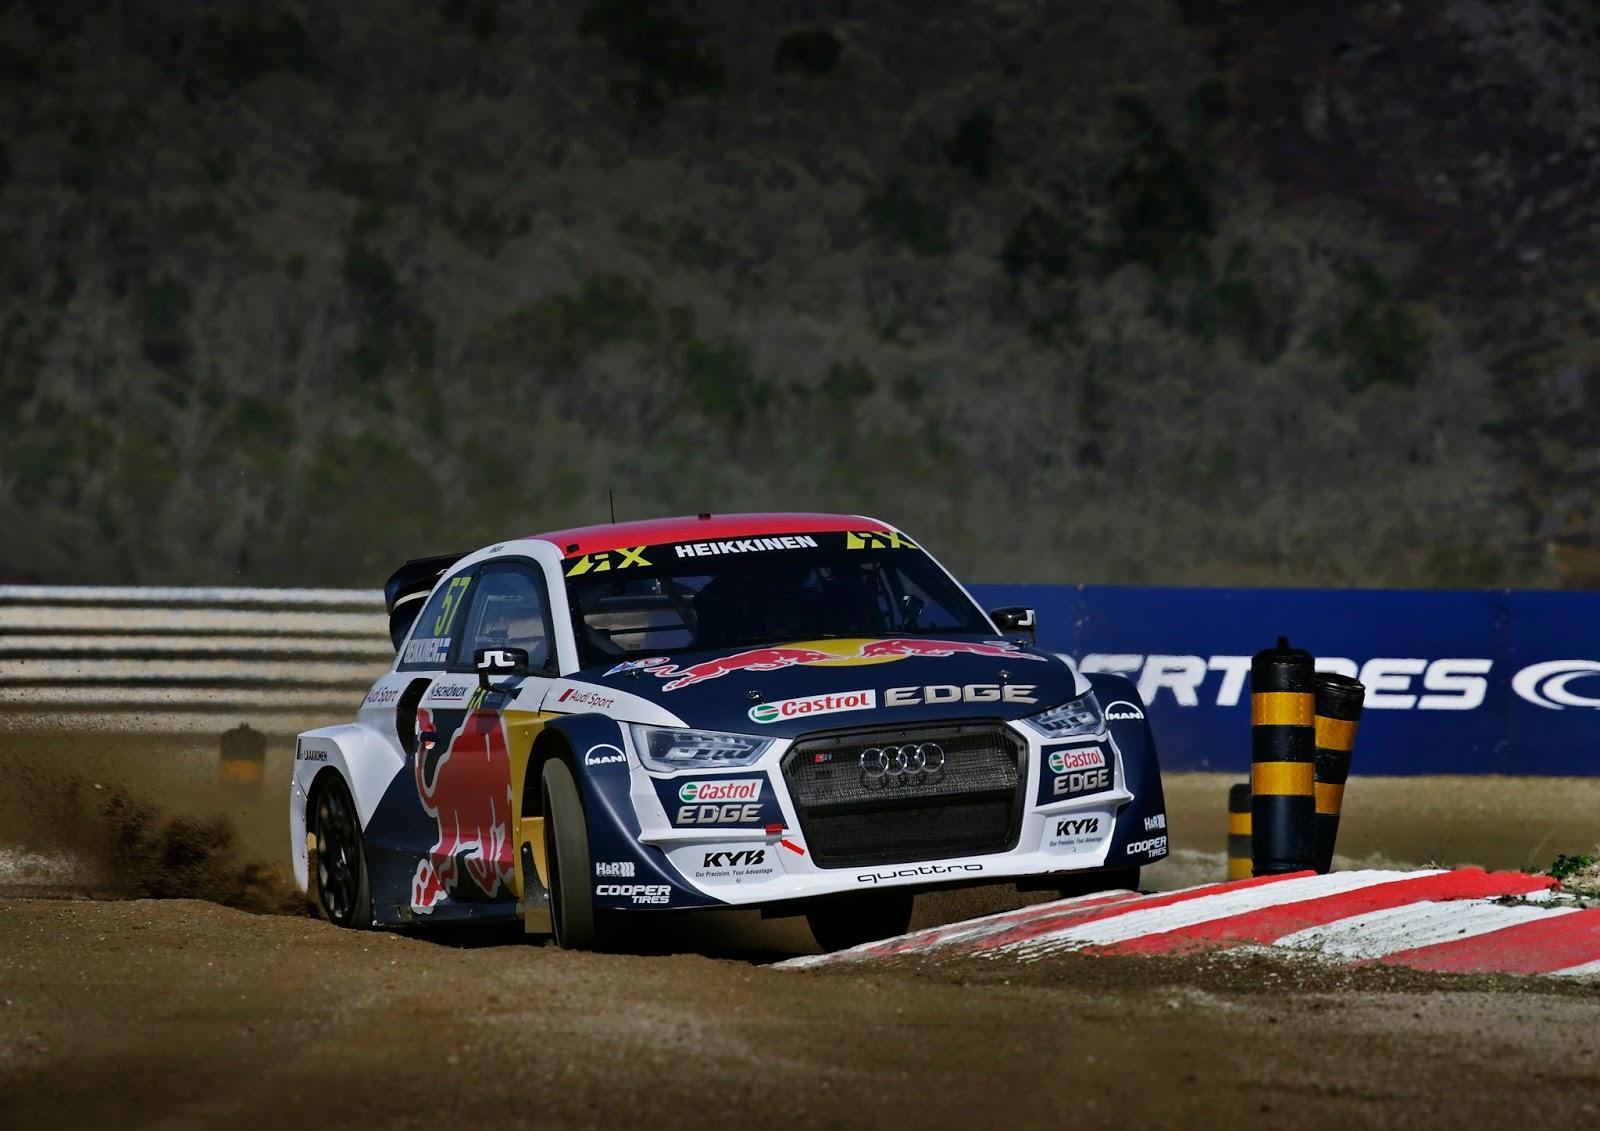 A173299 large 1 Δες όλο τον αγώνα του συναρπαστικού Rallycross FIA, FIA World Rallycross Championship, Rally, videos, World RX